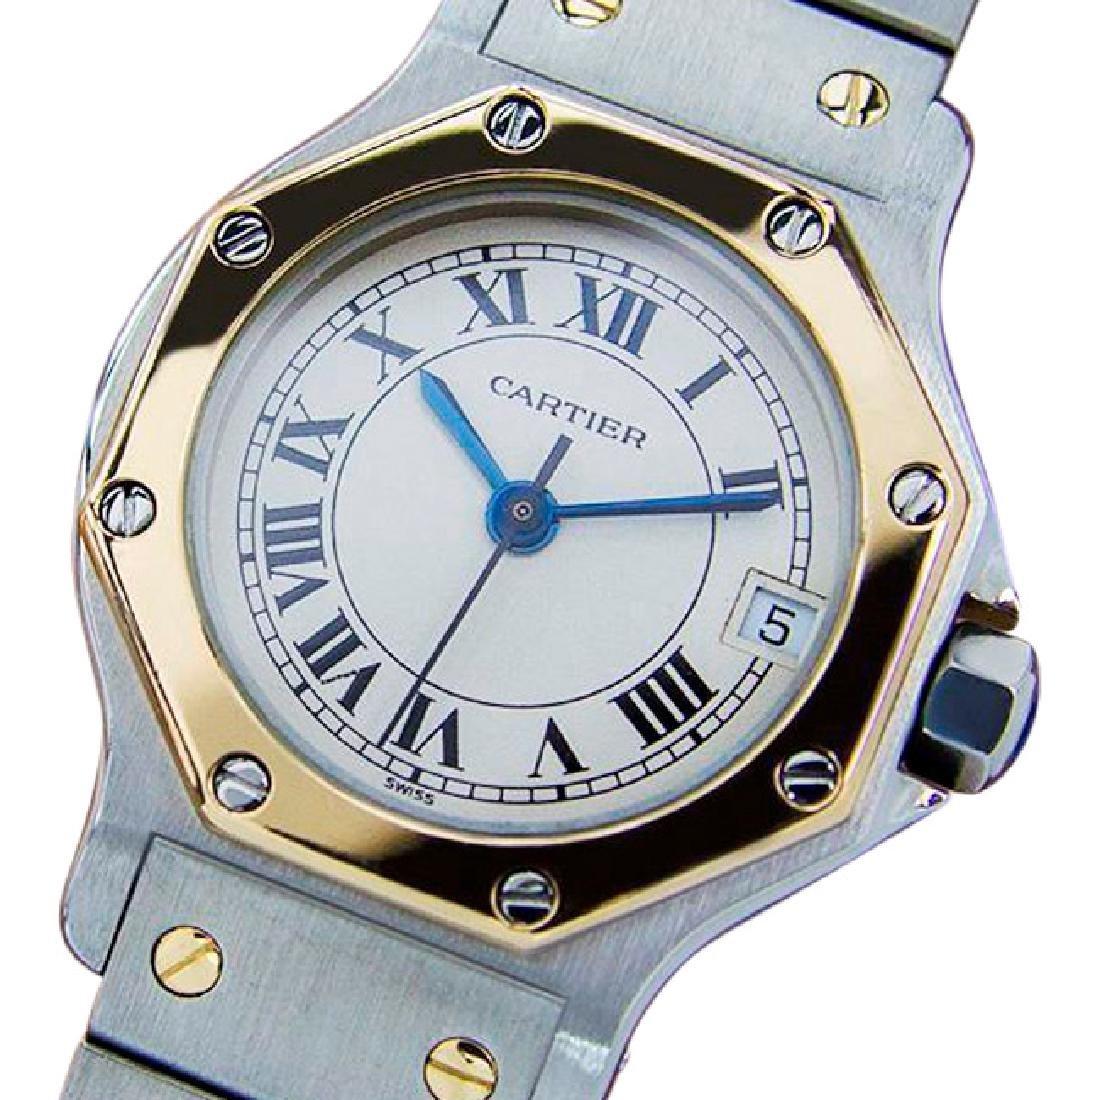 Cartier Santos Quartz 18K Gold Stainless Steel Watch